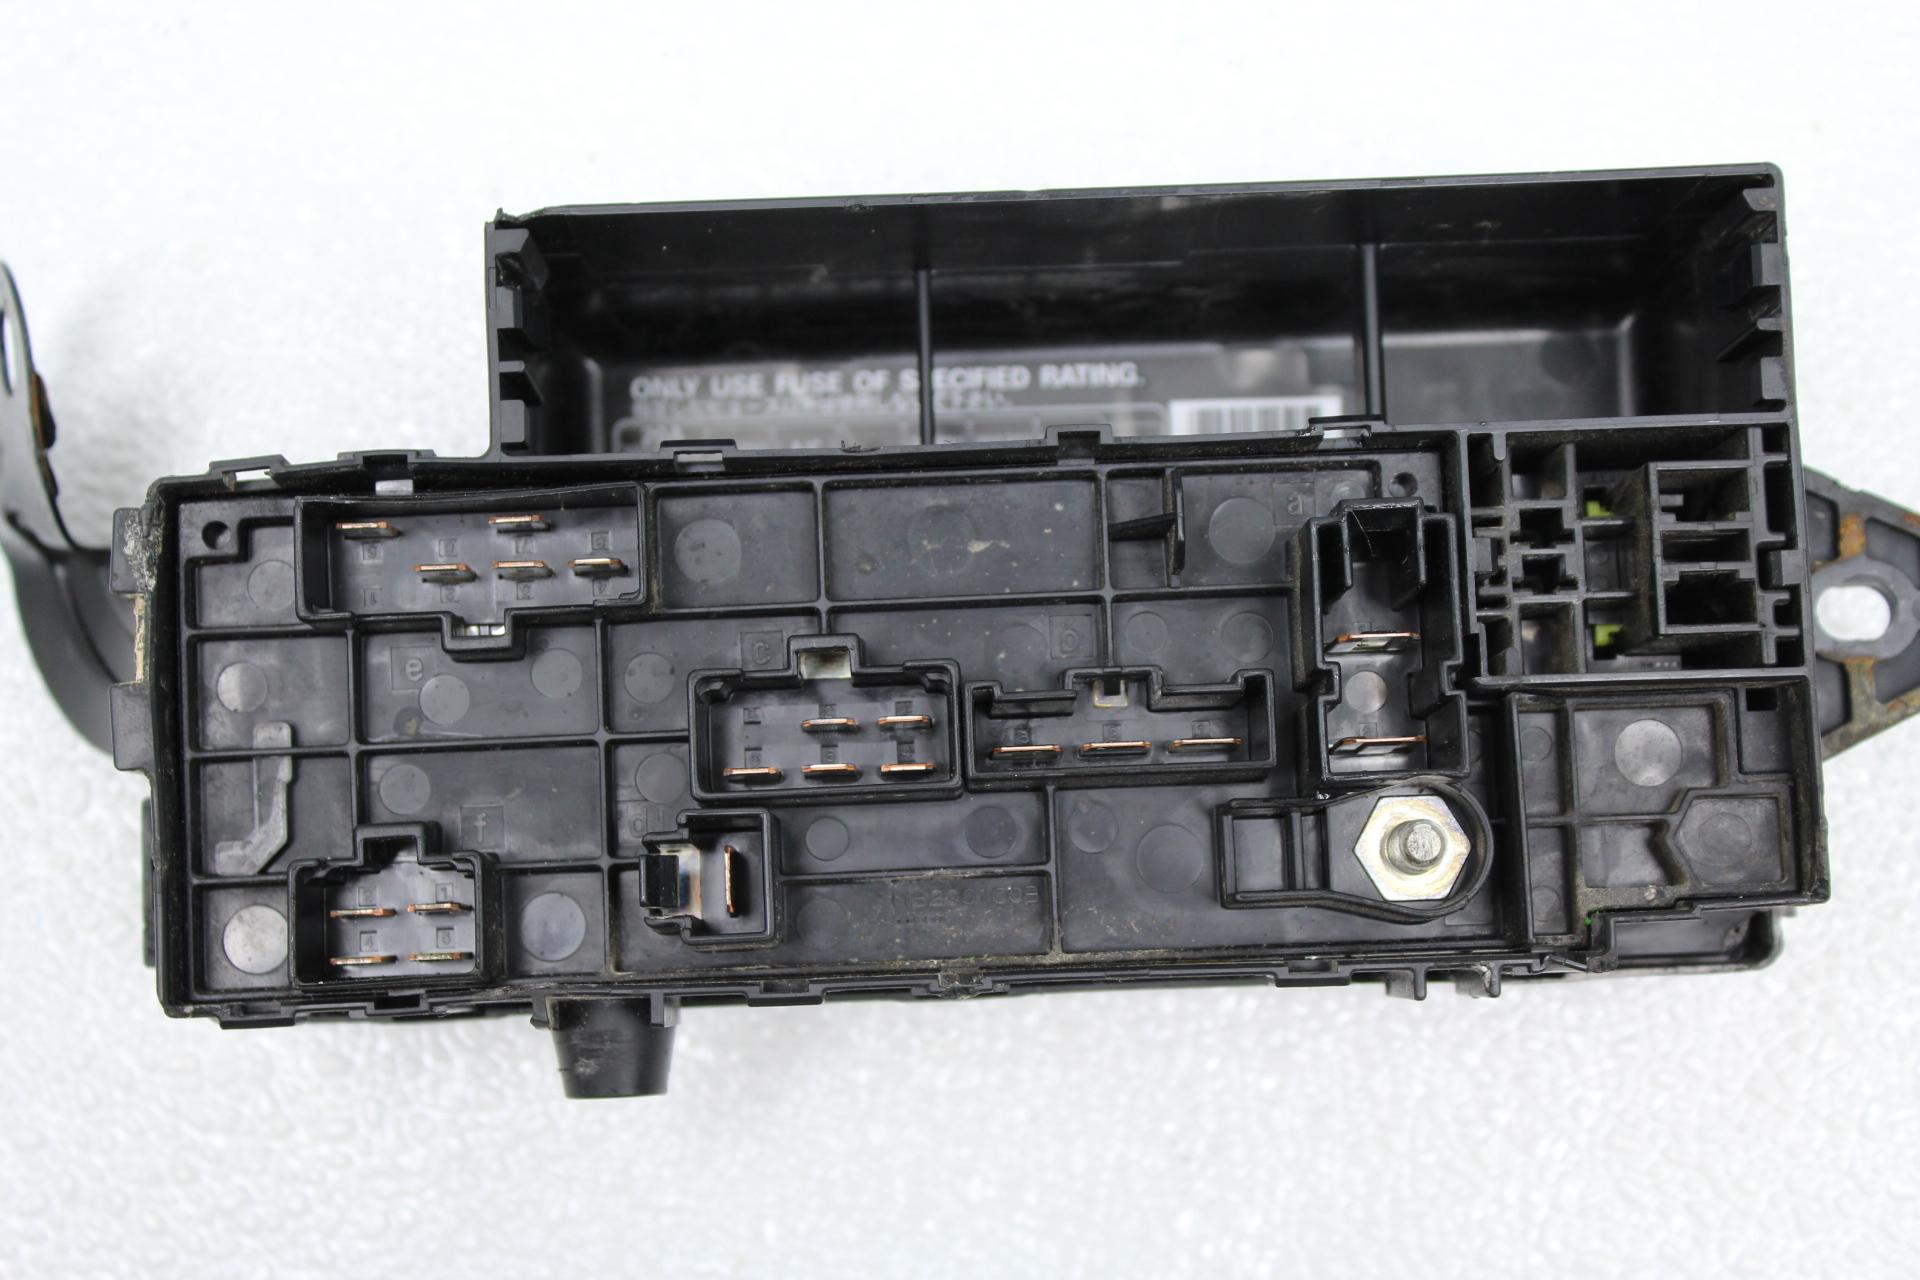 2002-2005 SUBARU IMPREZA WRX & STI ENGINE BAY FUSE BOX PANEL ASSEMBLY